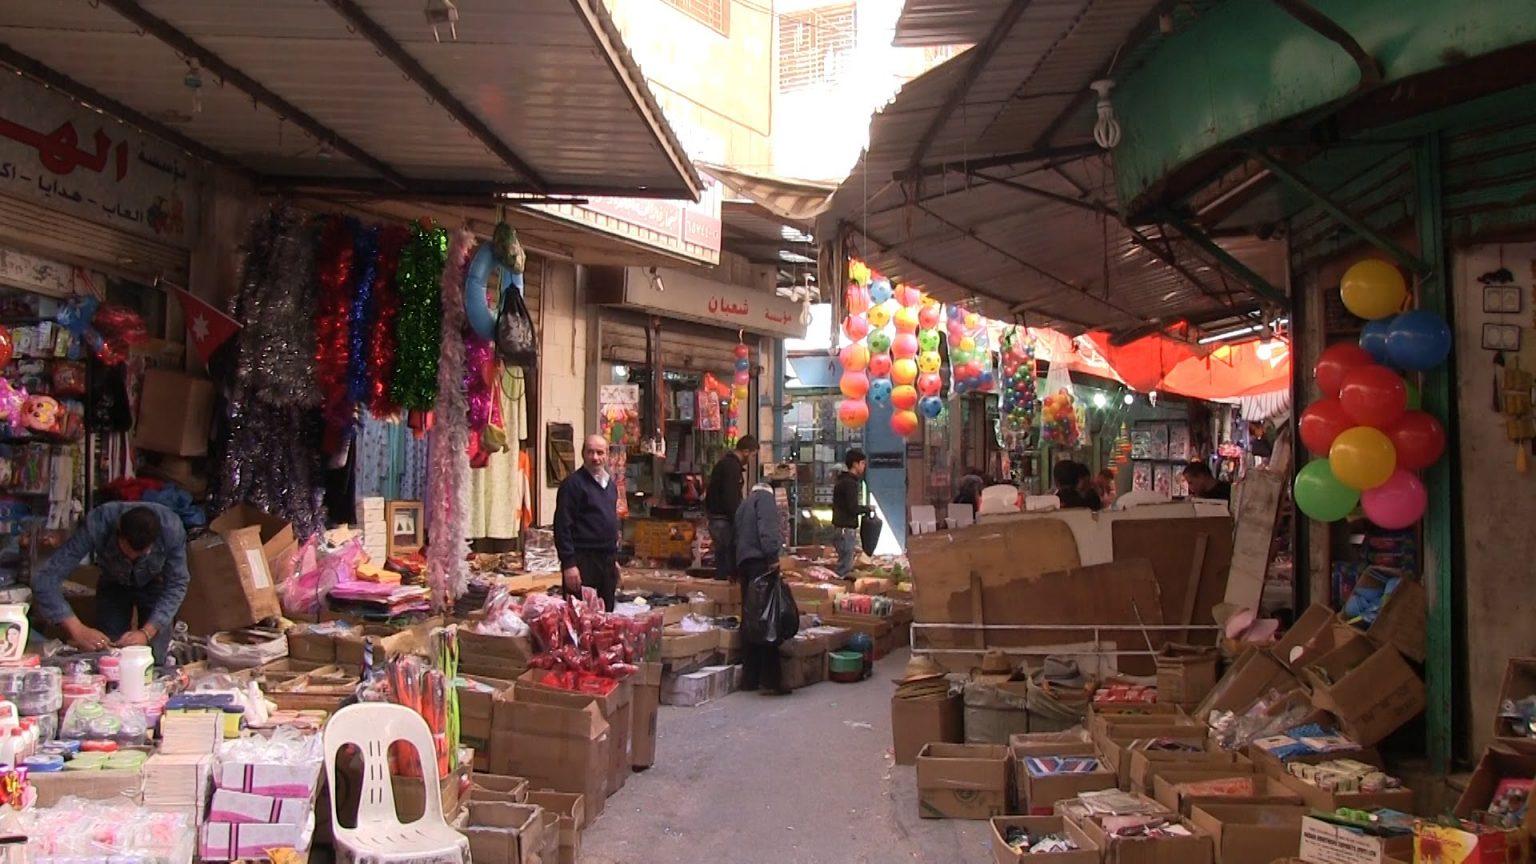 Jordan's trade deficit